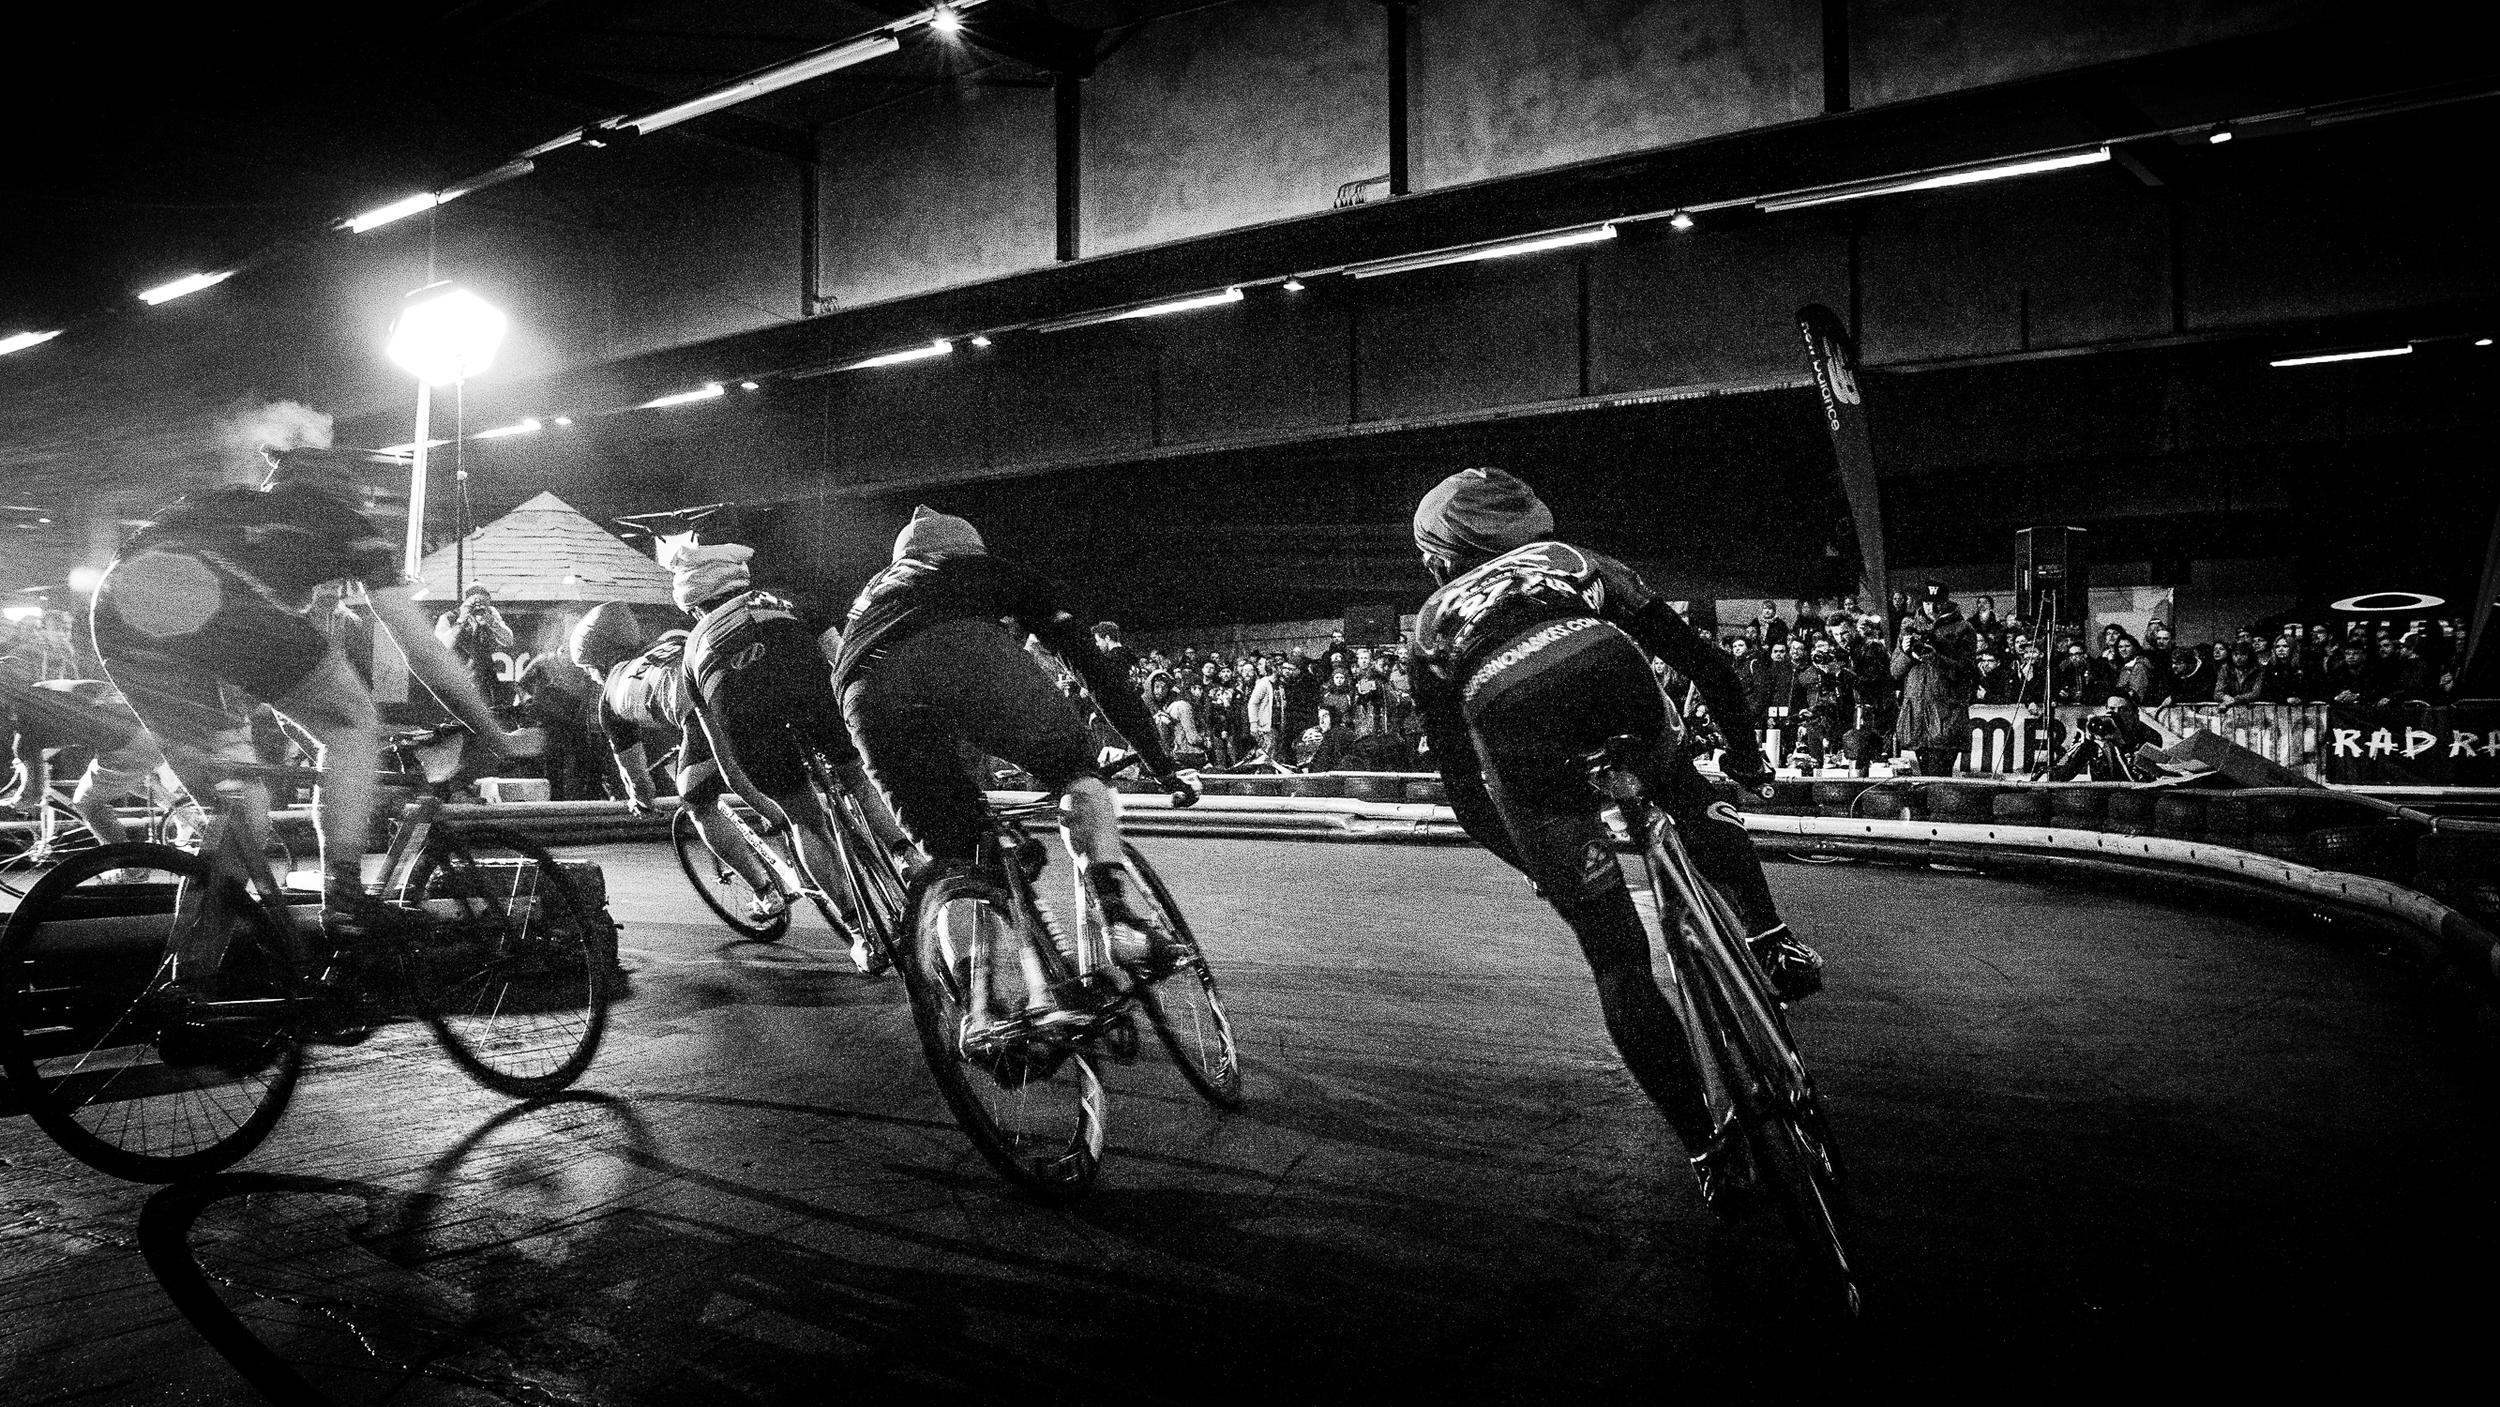 RAD RACE Last Man Standing, Berlin 2015